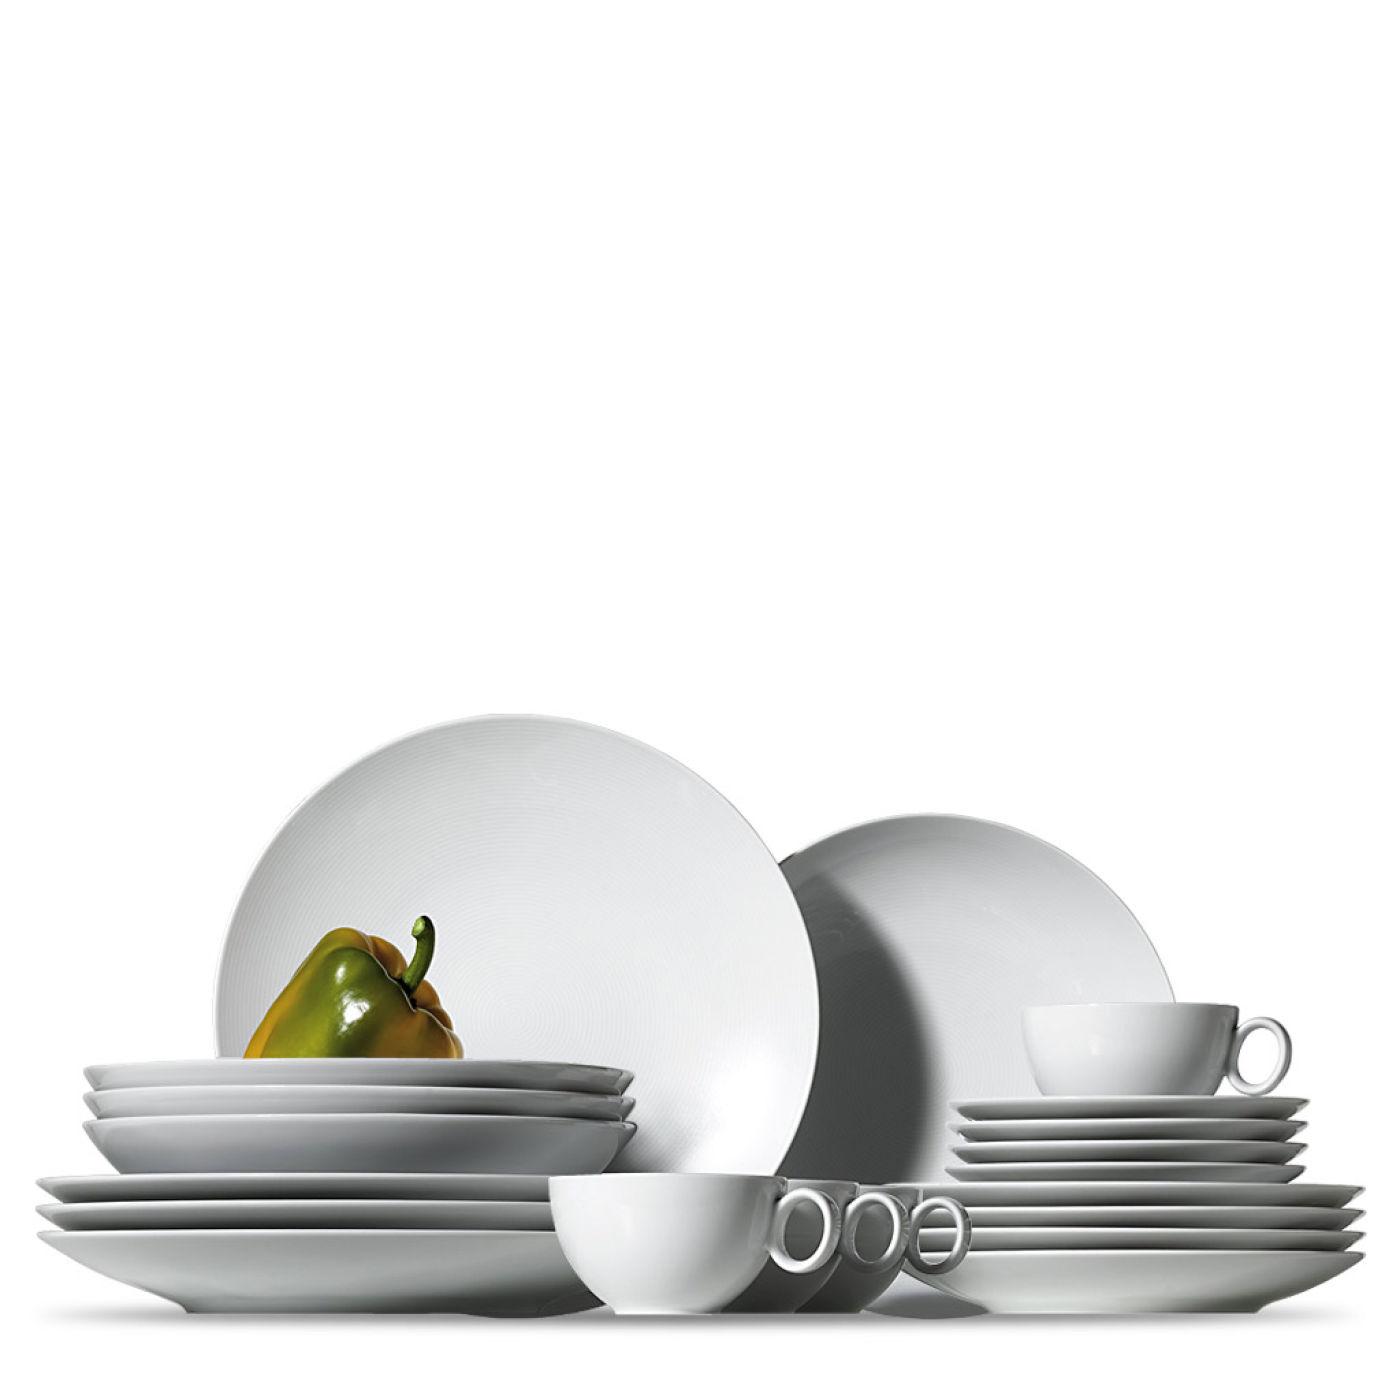 Онлайн каталог PROMENU: Набор столовой посуды Rosenthal LOFT, белый, 16 предметов Rosenthal 11900-800001-18844